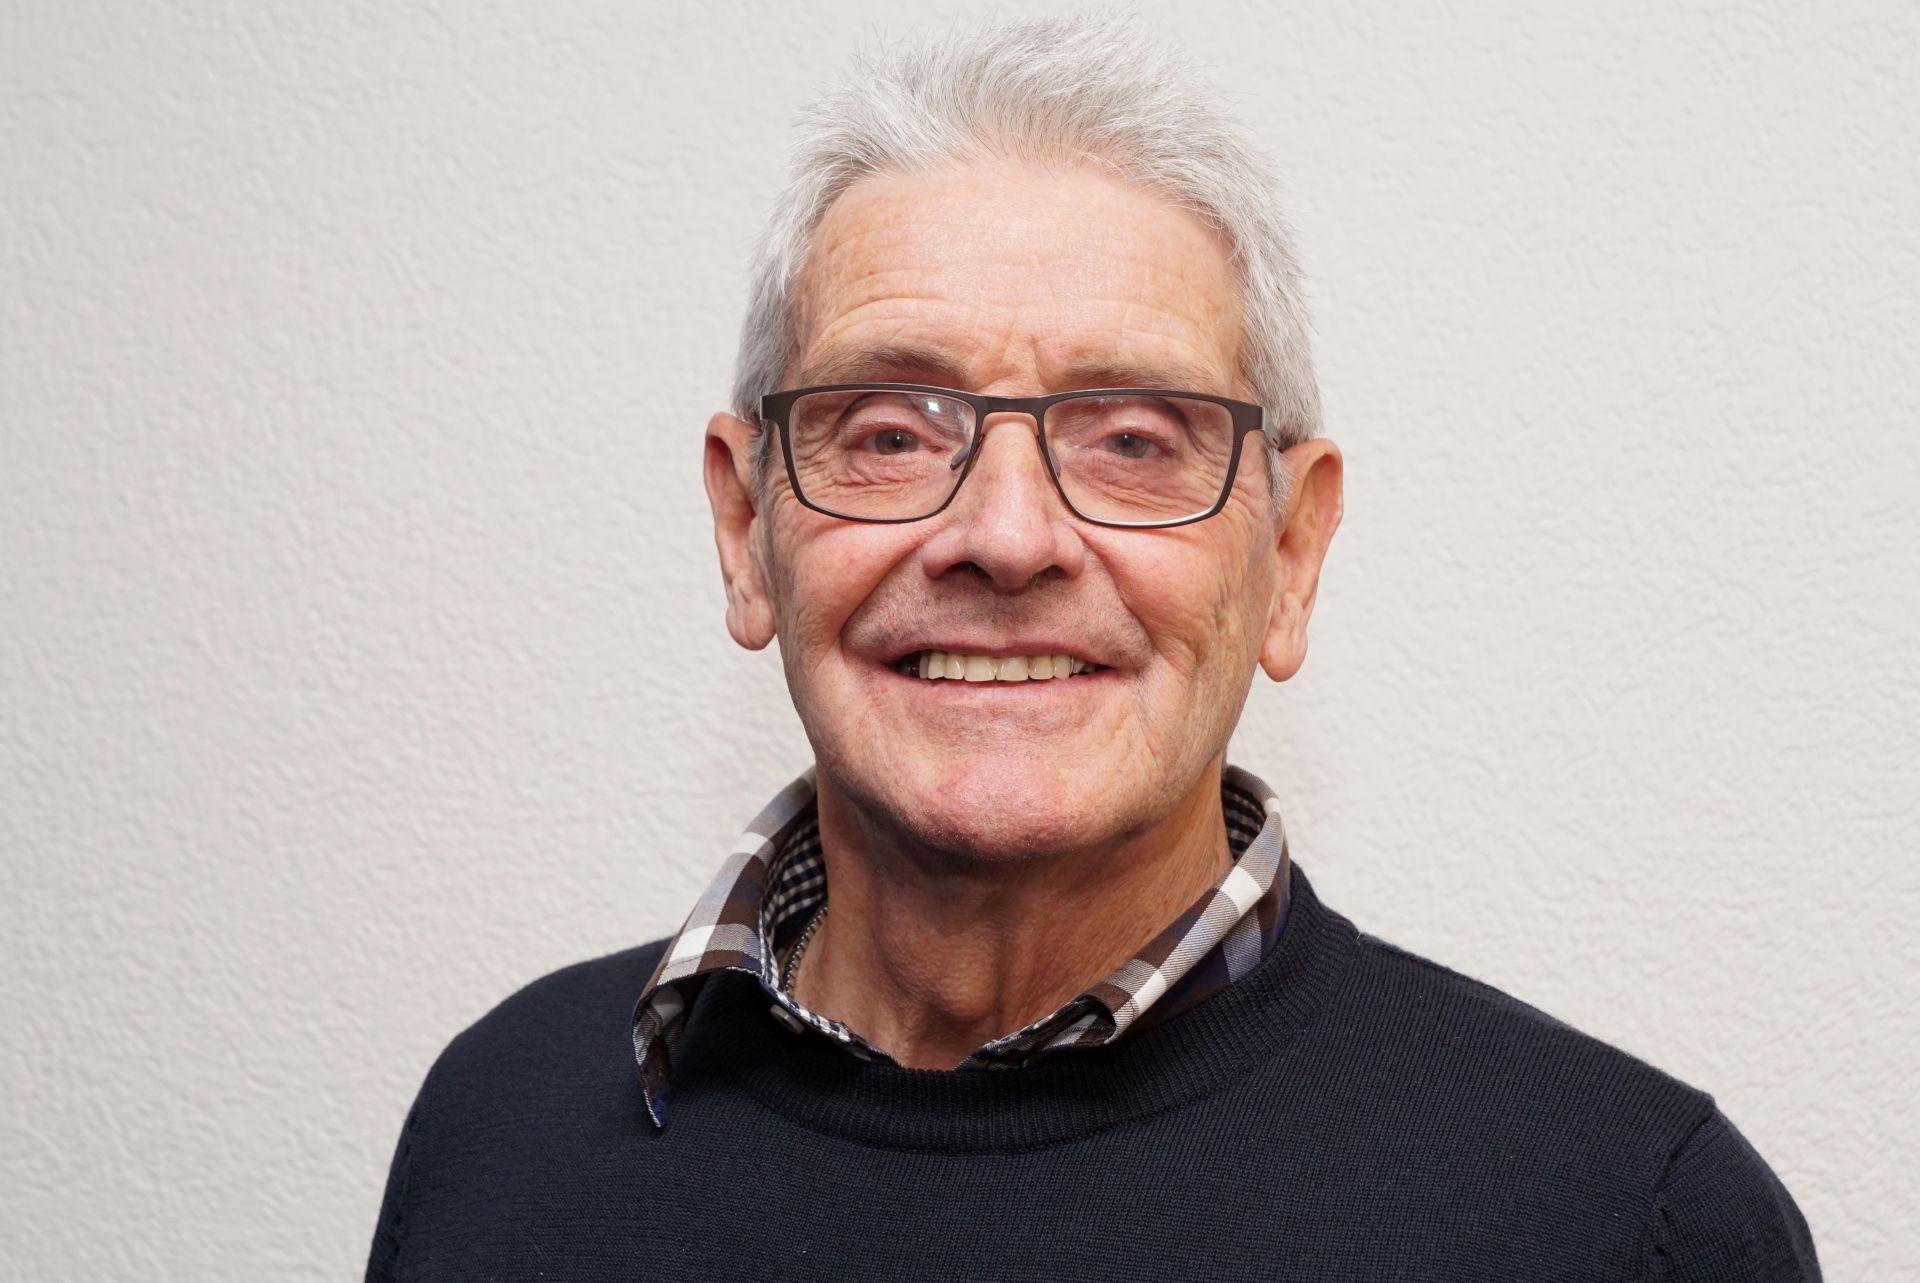 Stettler Ernst - Büren zum Hof-Limpach-Schalunen-Grafenried-Kernenried-Zauggenried